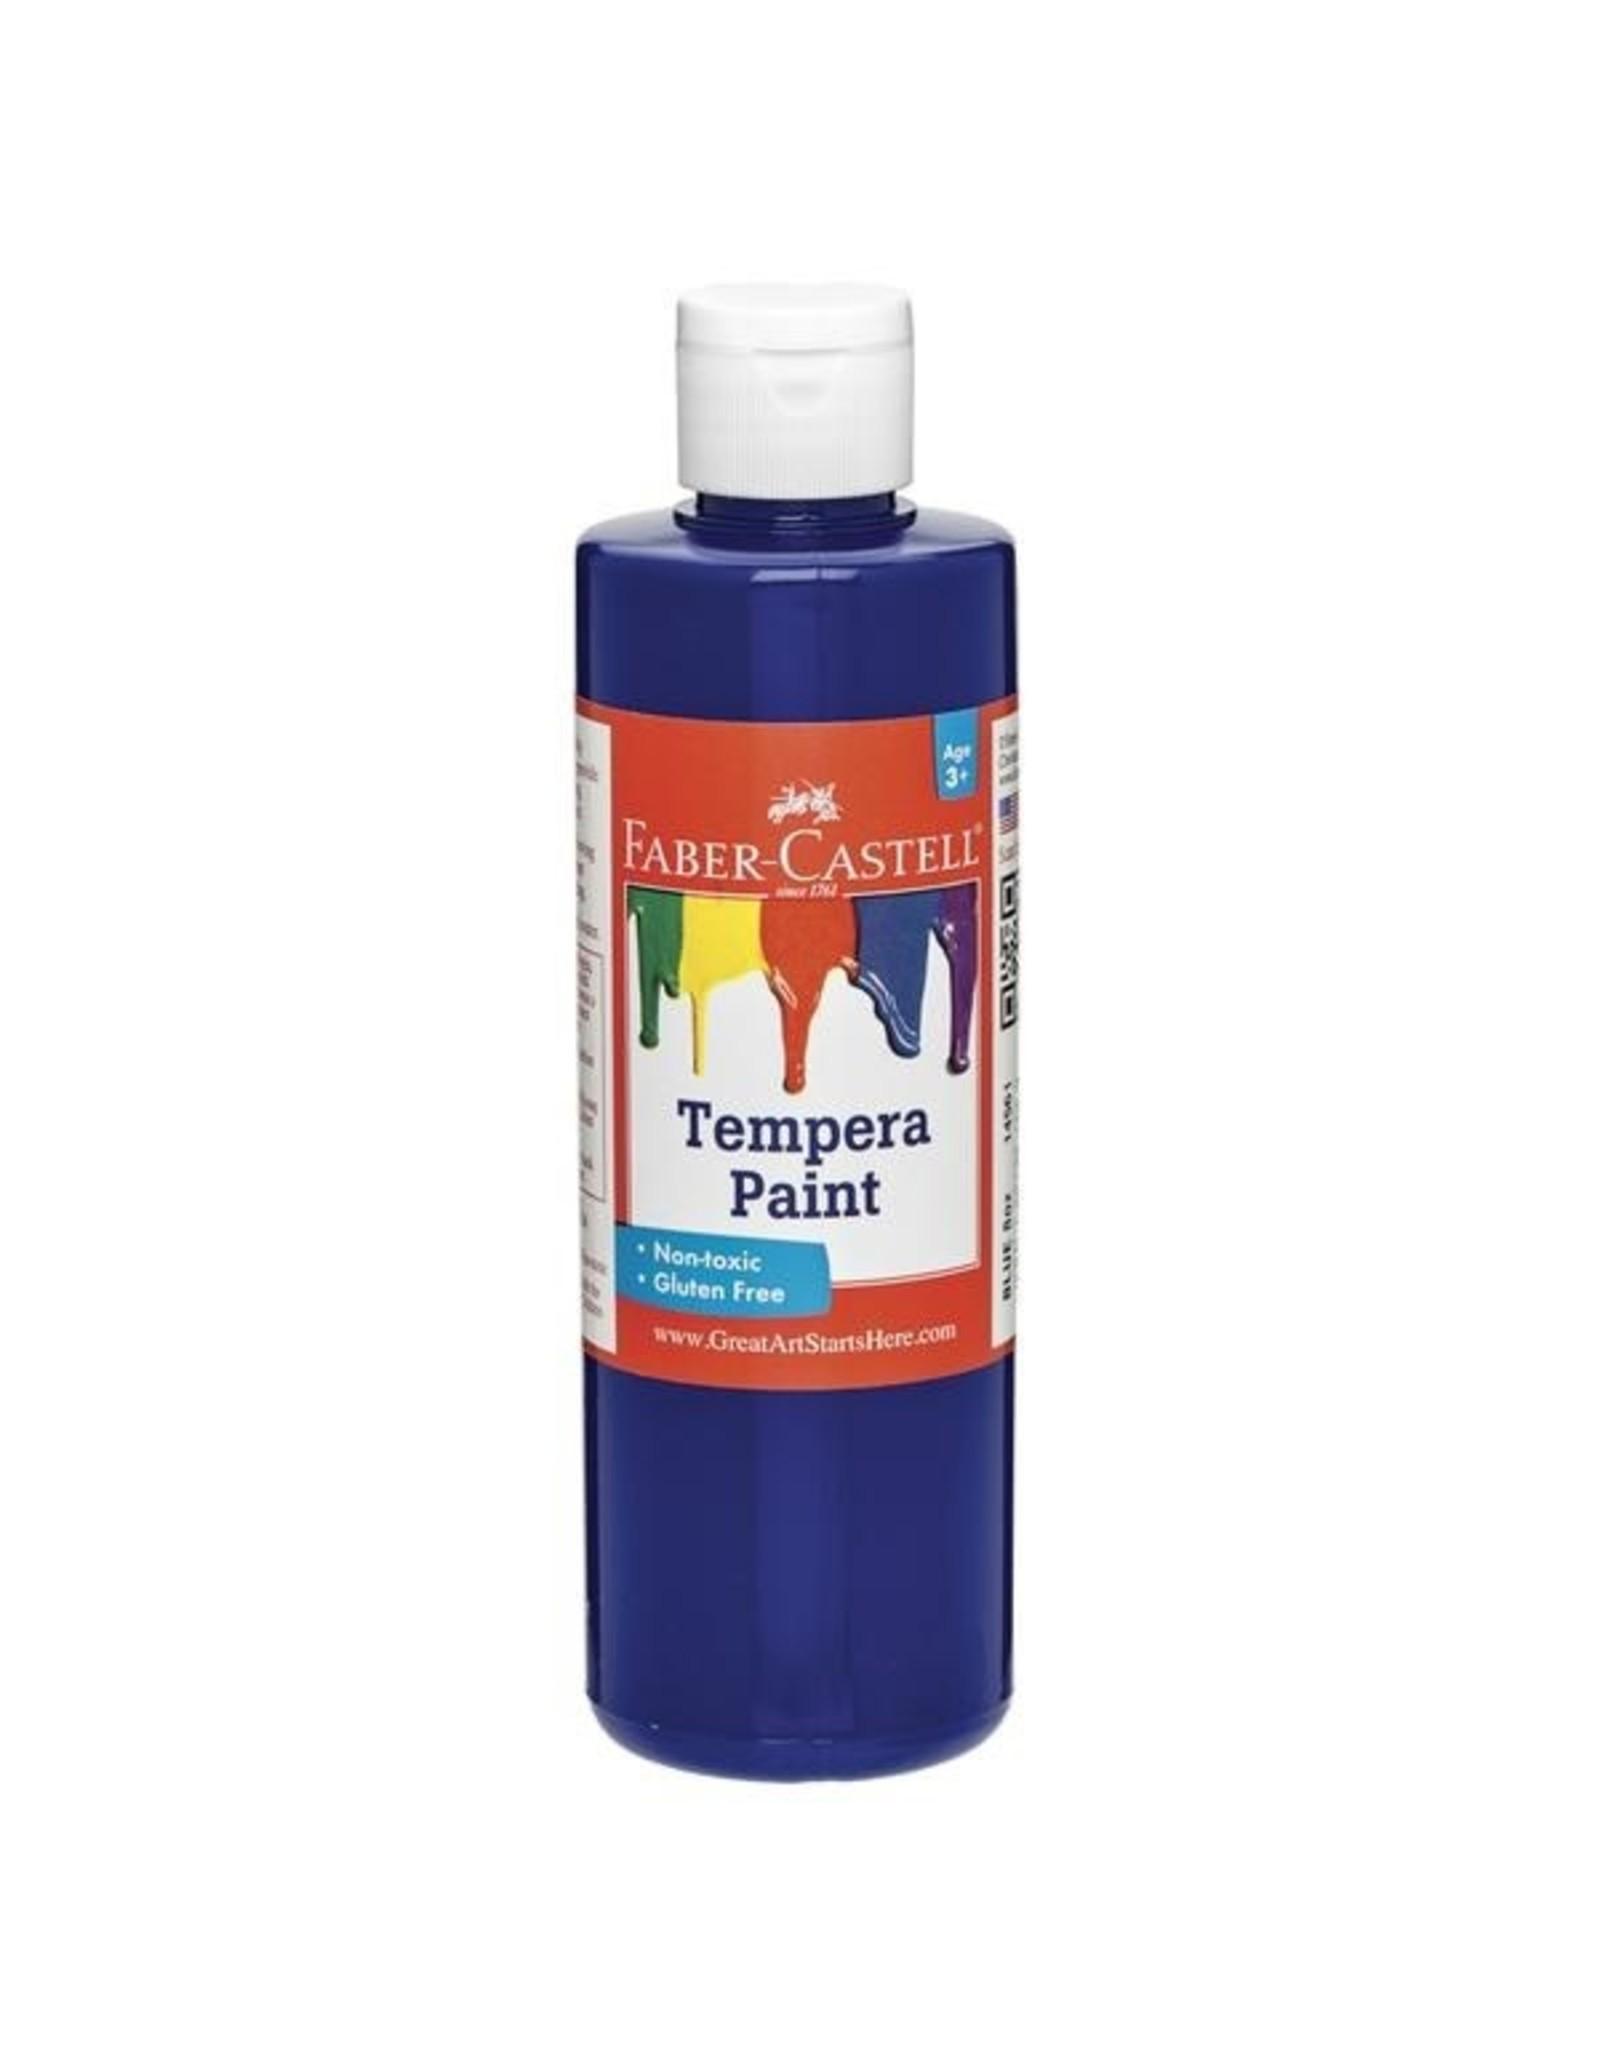 Faber-Castell Blue Tempera Paint (8 oz bottles)